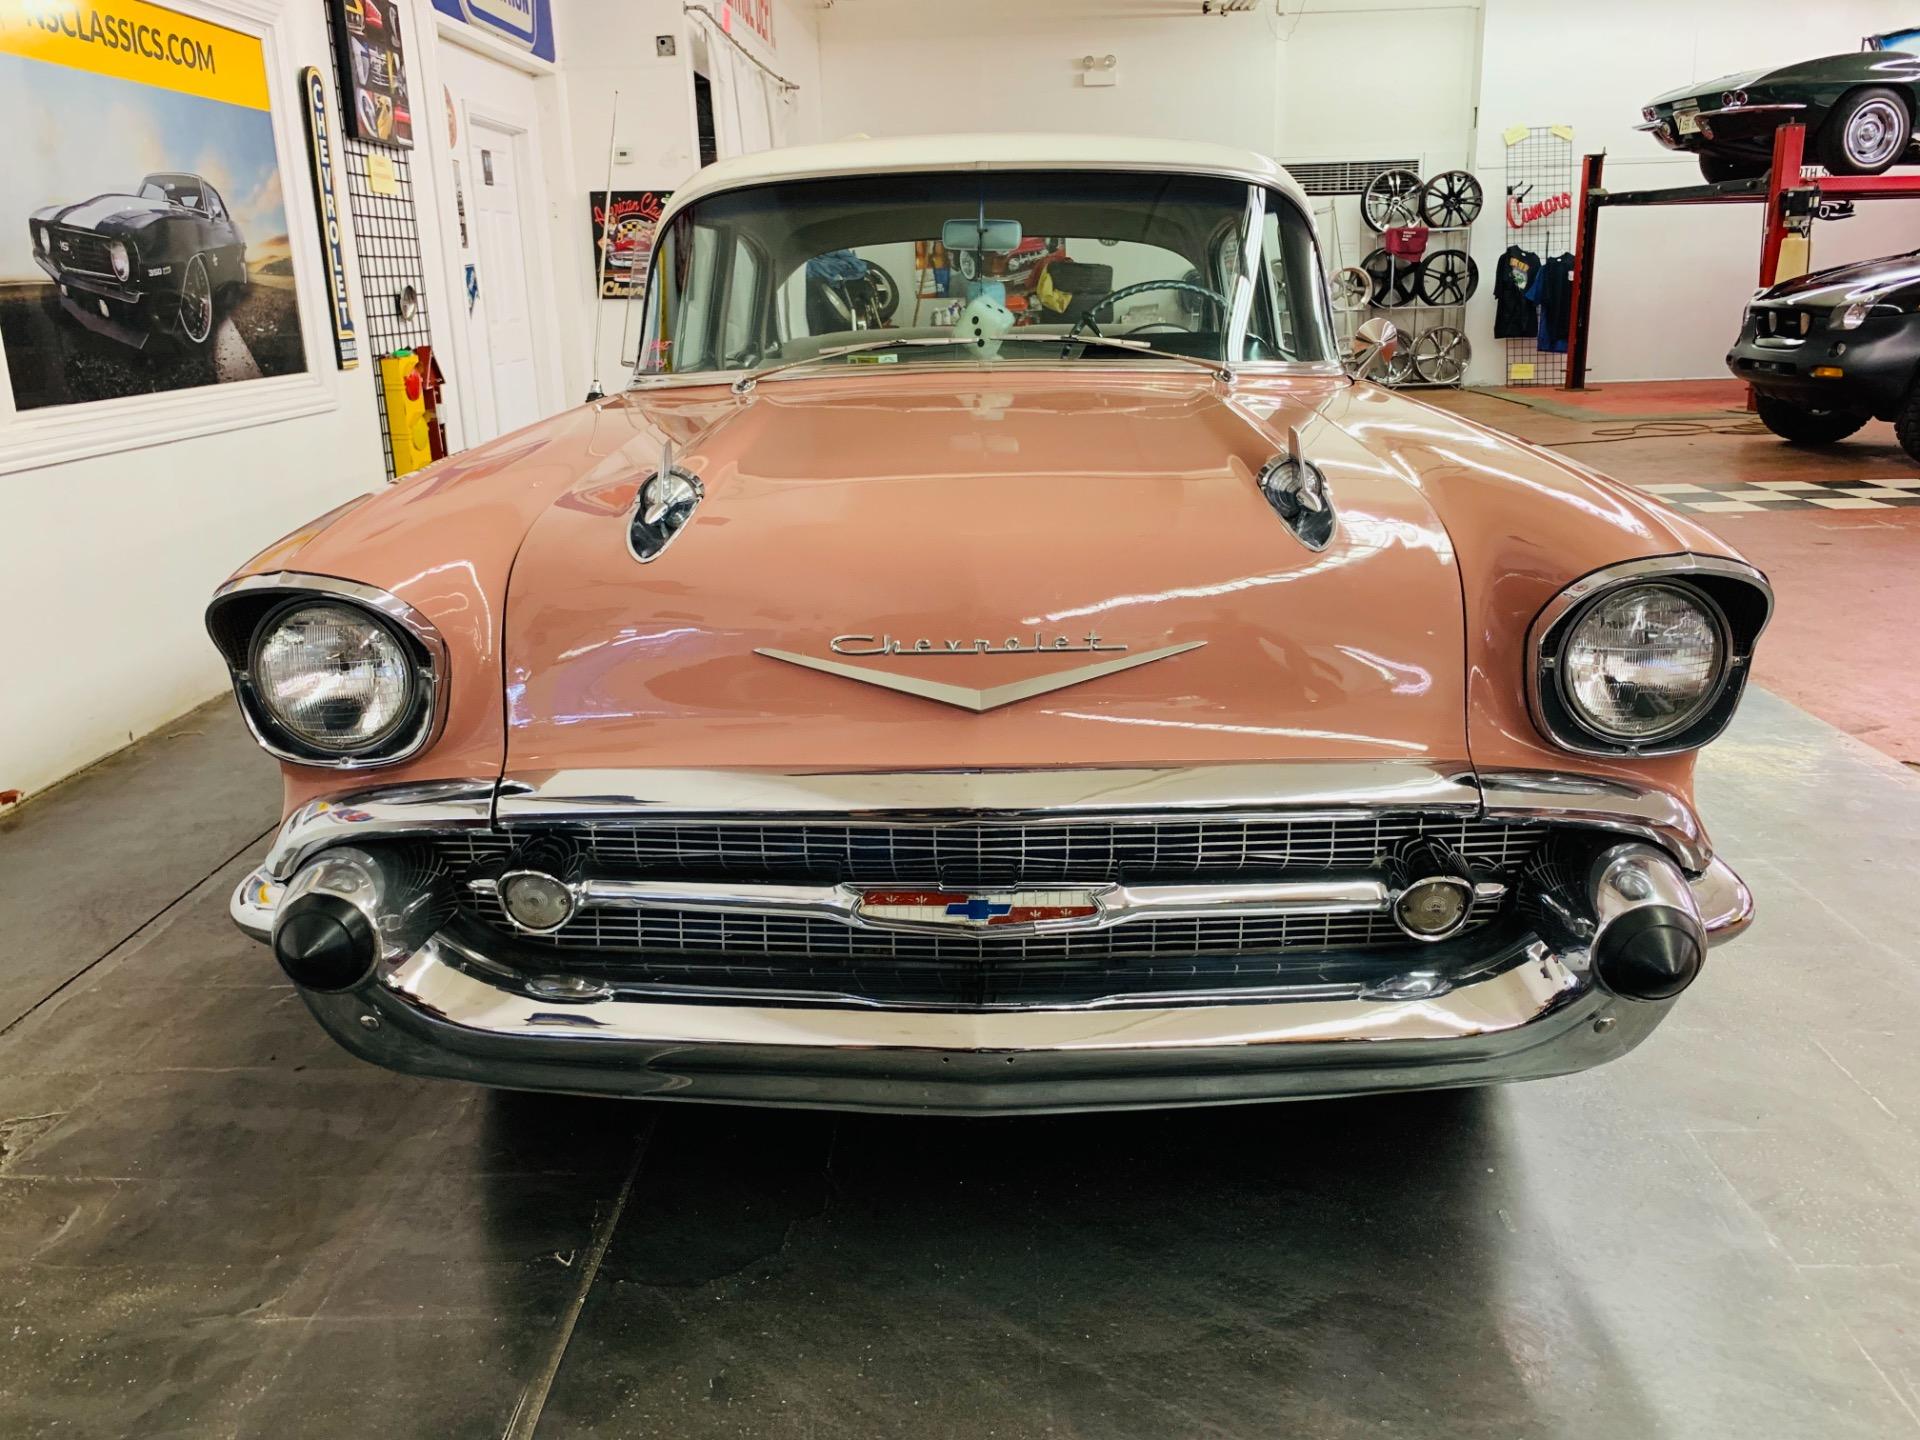 Used 1957 Chevrolet Bel Air/150/210 -4 DOOR SEDAN - CANYON CORAL - GREAT ORIGINAL CONDITION   Mundelein, IL